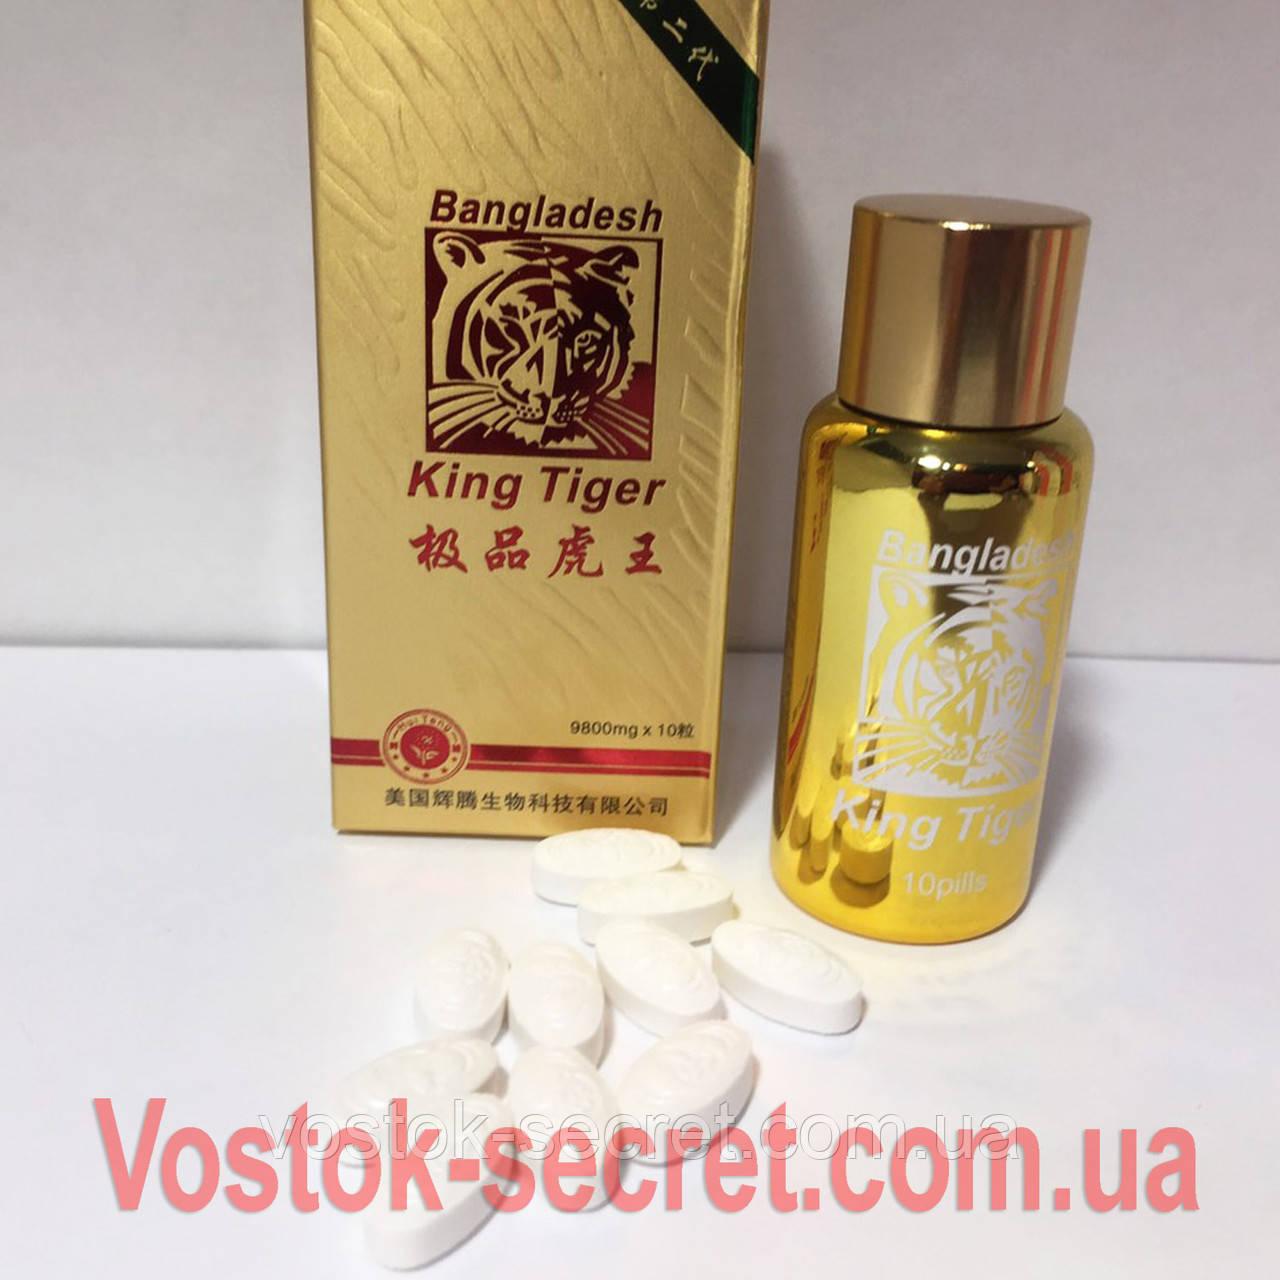 Король Тигр (Tiger King) - препарат для потенции, сексуальности и либидо. 10табл*9800